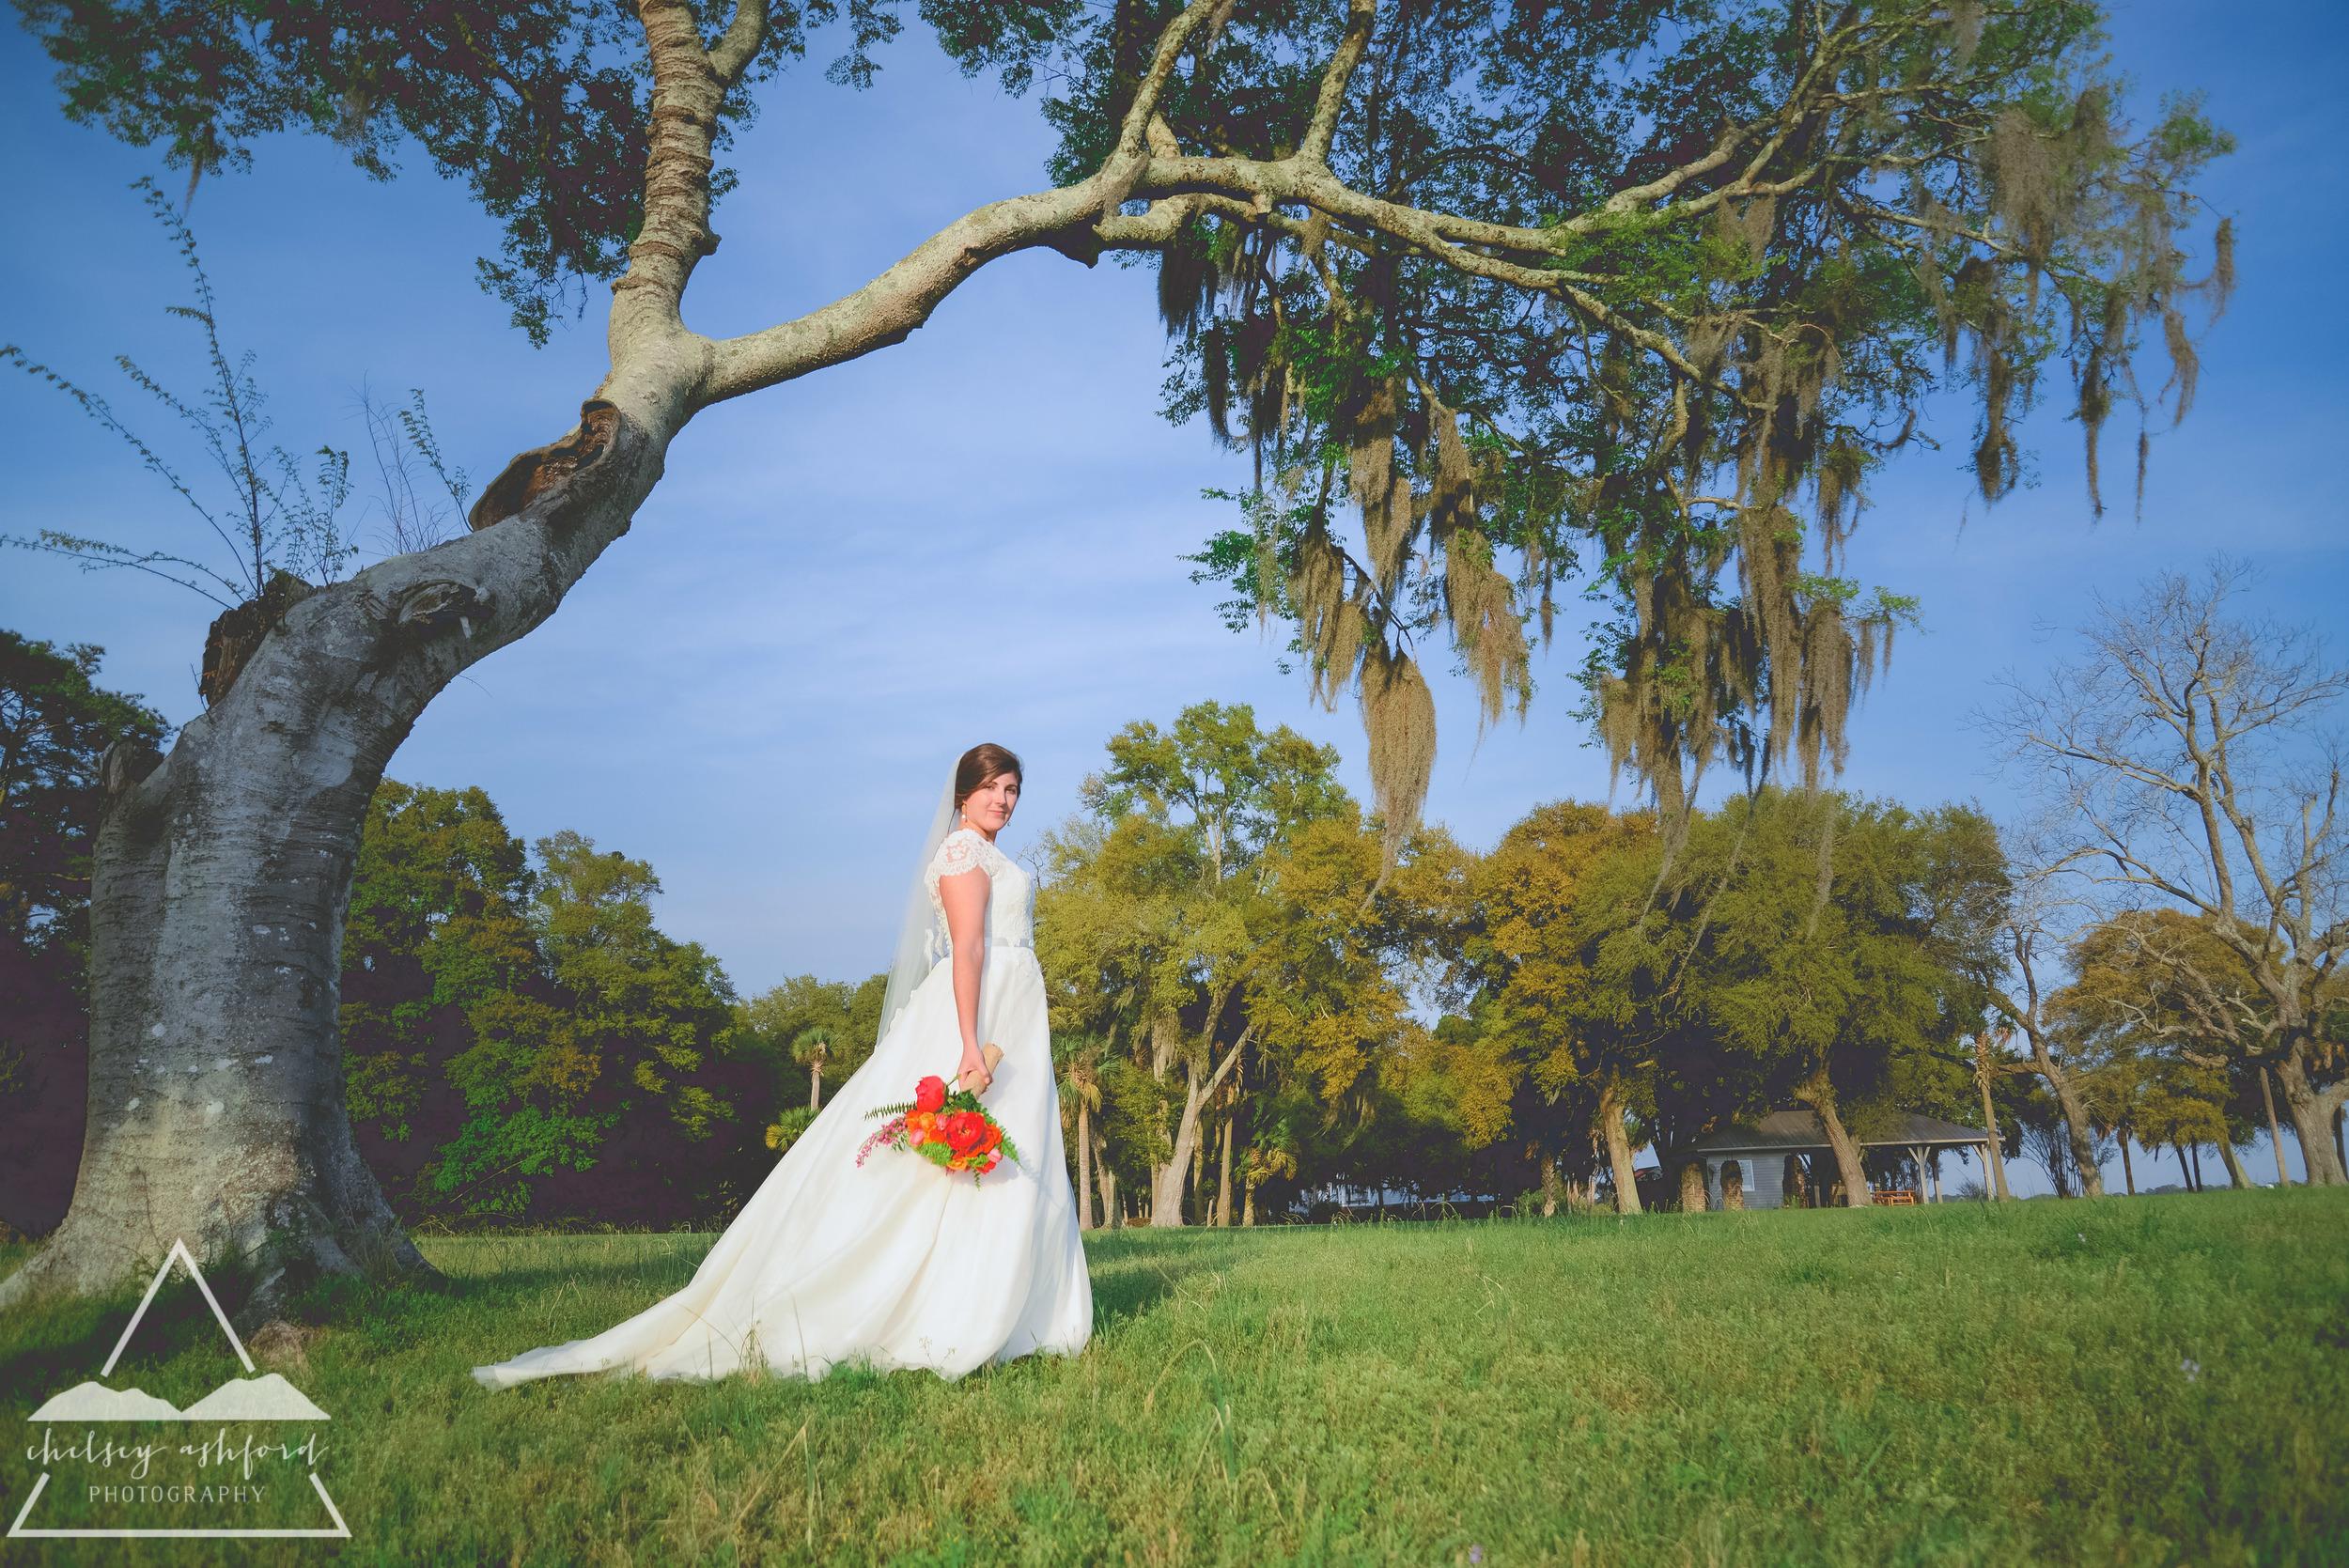 Sylvia_bridals_web-39.jpg